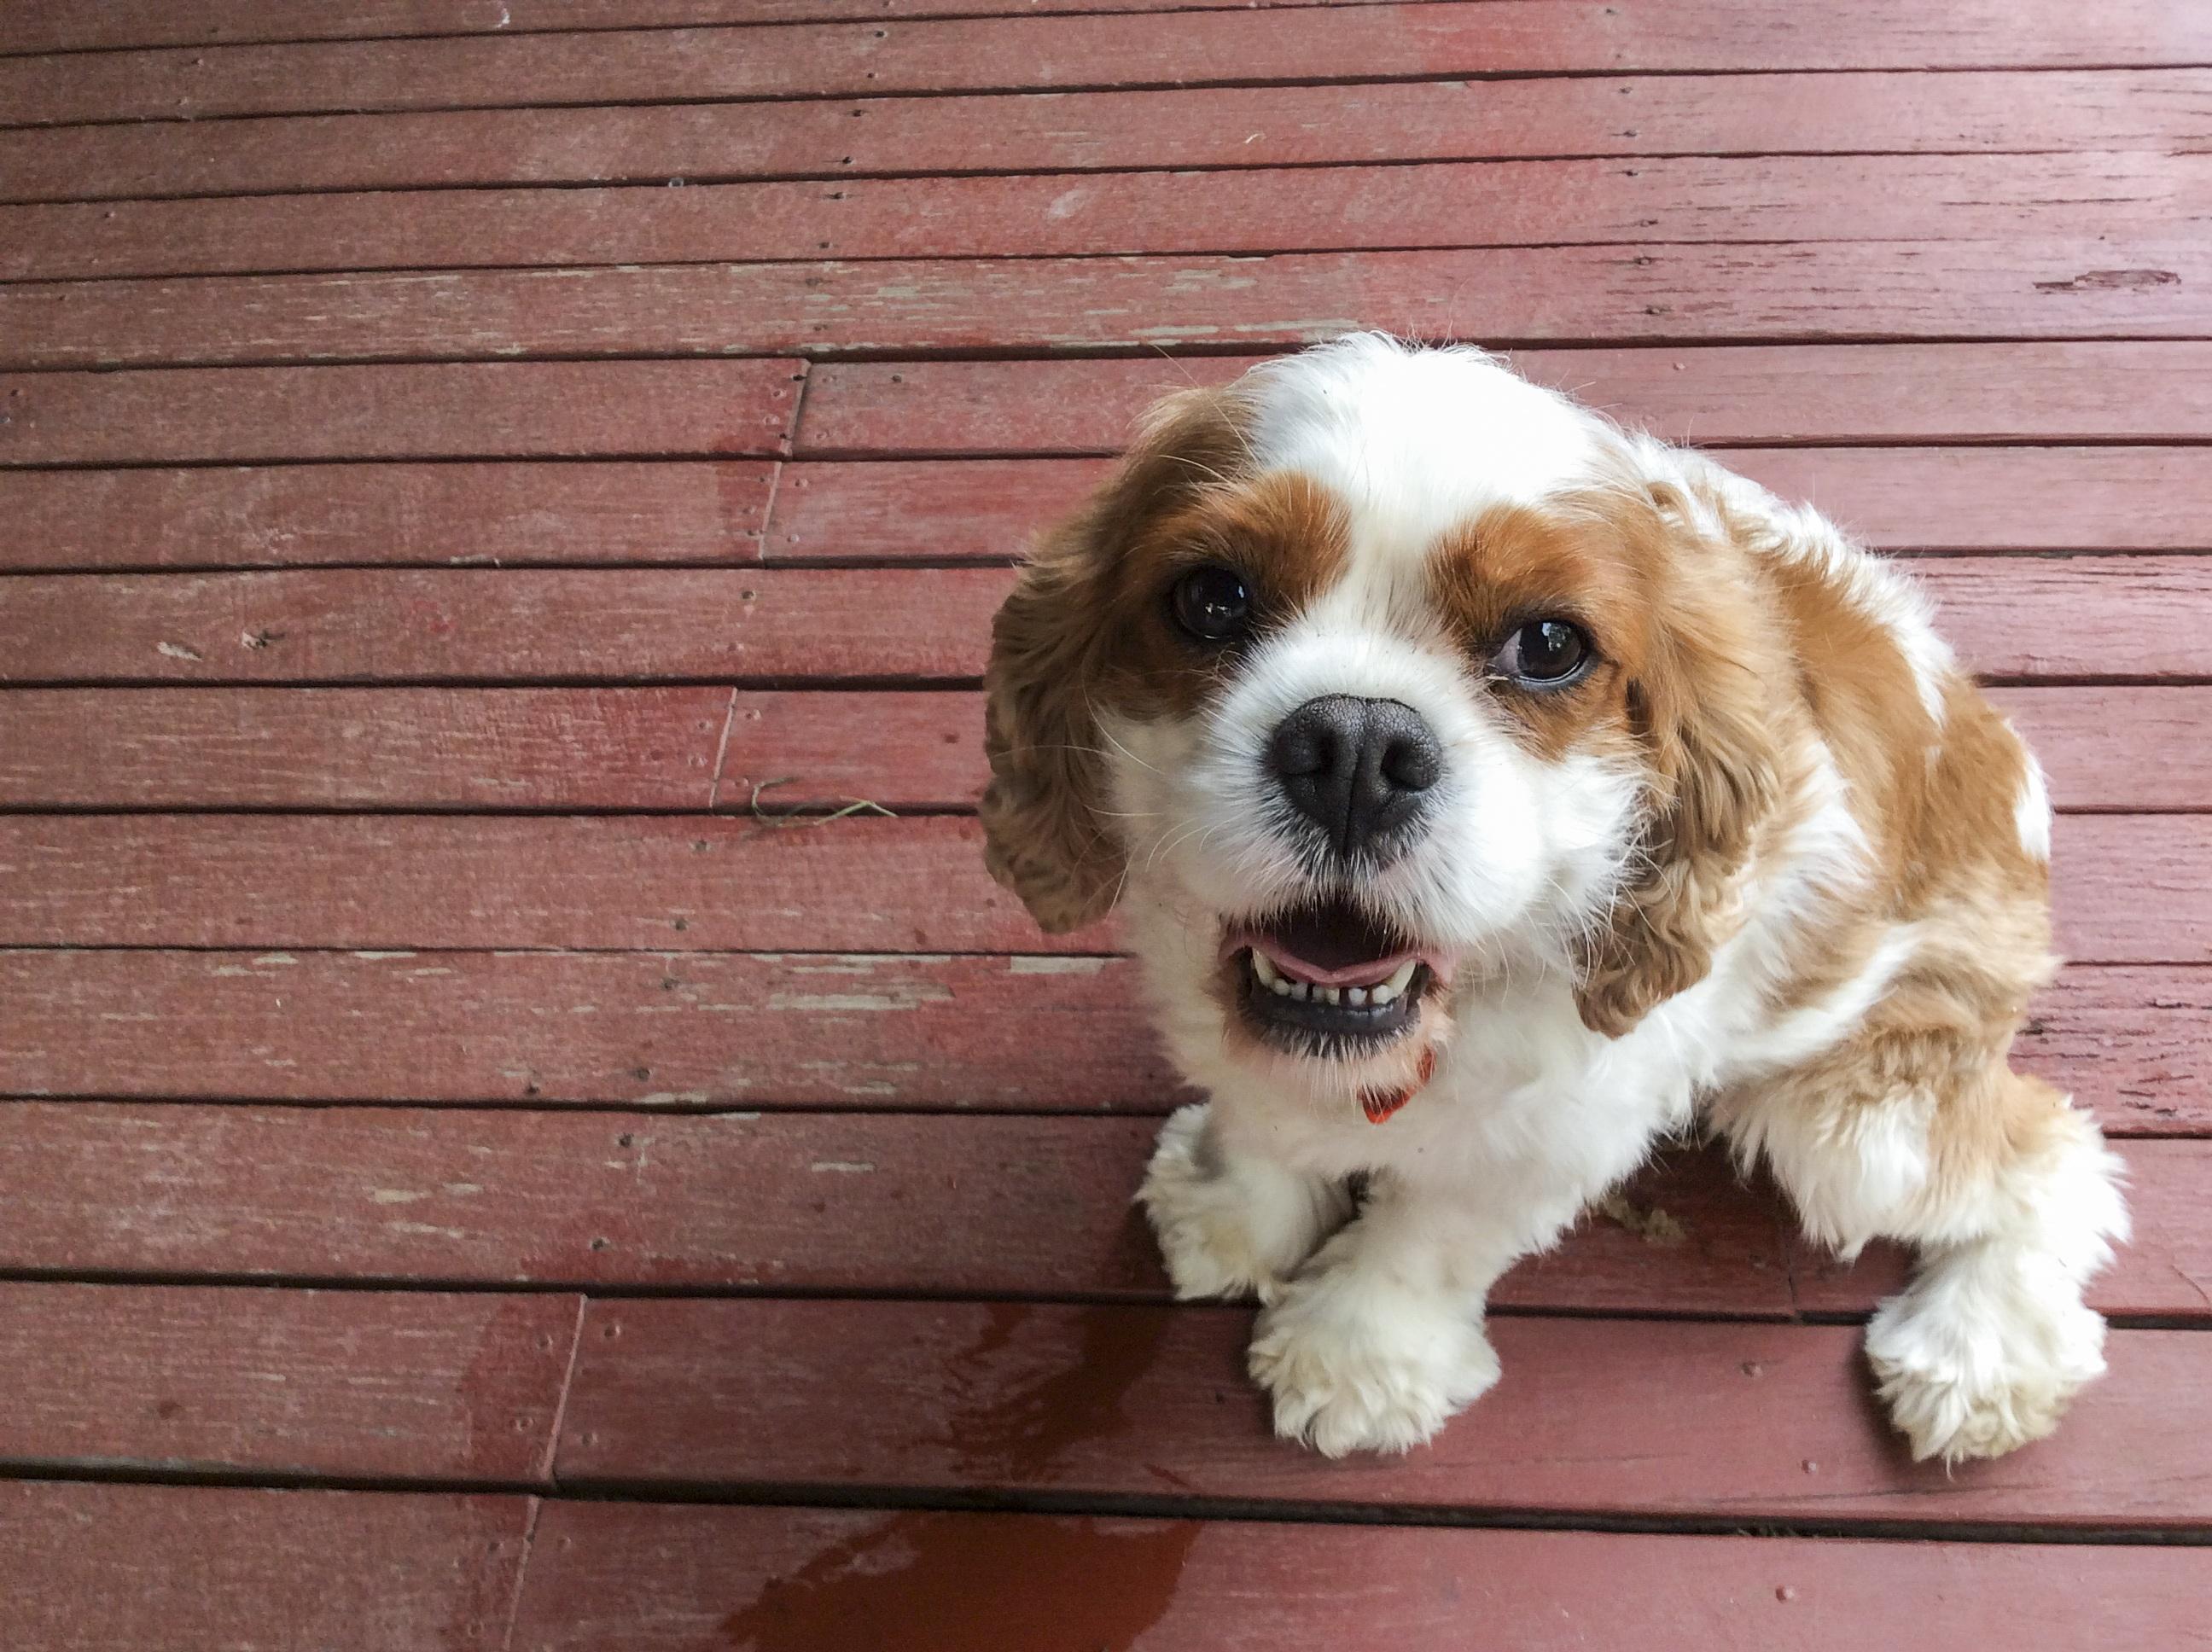 Good Cavalier Canine Adorable Dog - puppy-dog-cute-canine-pet-mammal-friend-spaniel-vertebrate-dog-breed-doggy-cavapoo-purebred-pedigree-cavalier-king-charles-spaniel-king-charles-spaniel-dog-like-mammal-dog-crossbreeds-cavachon-1394967  Snapshot_469497  .jpg